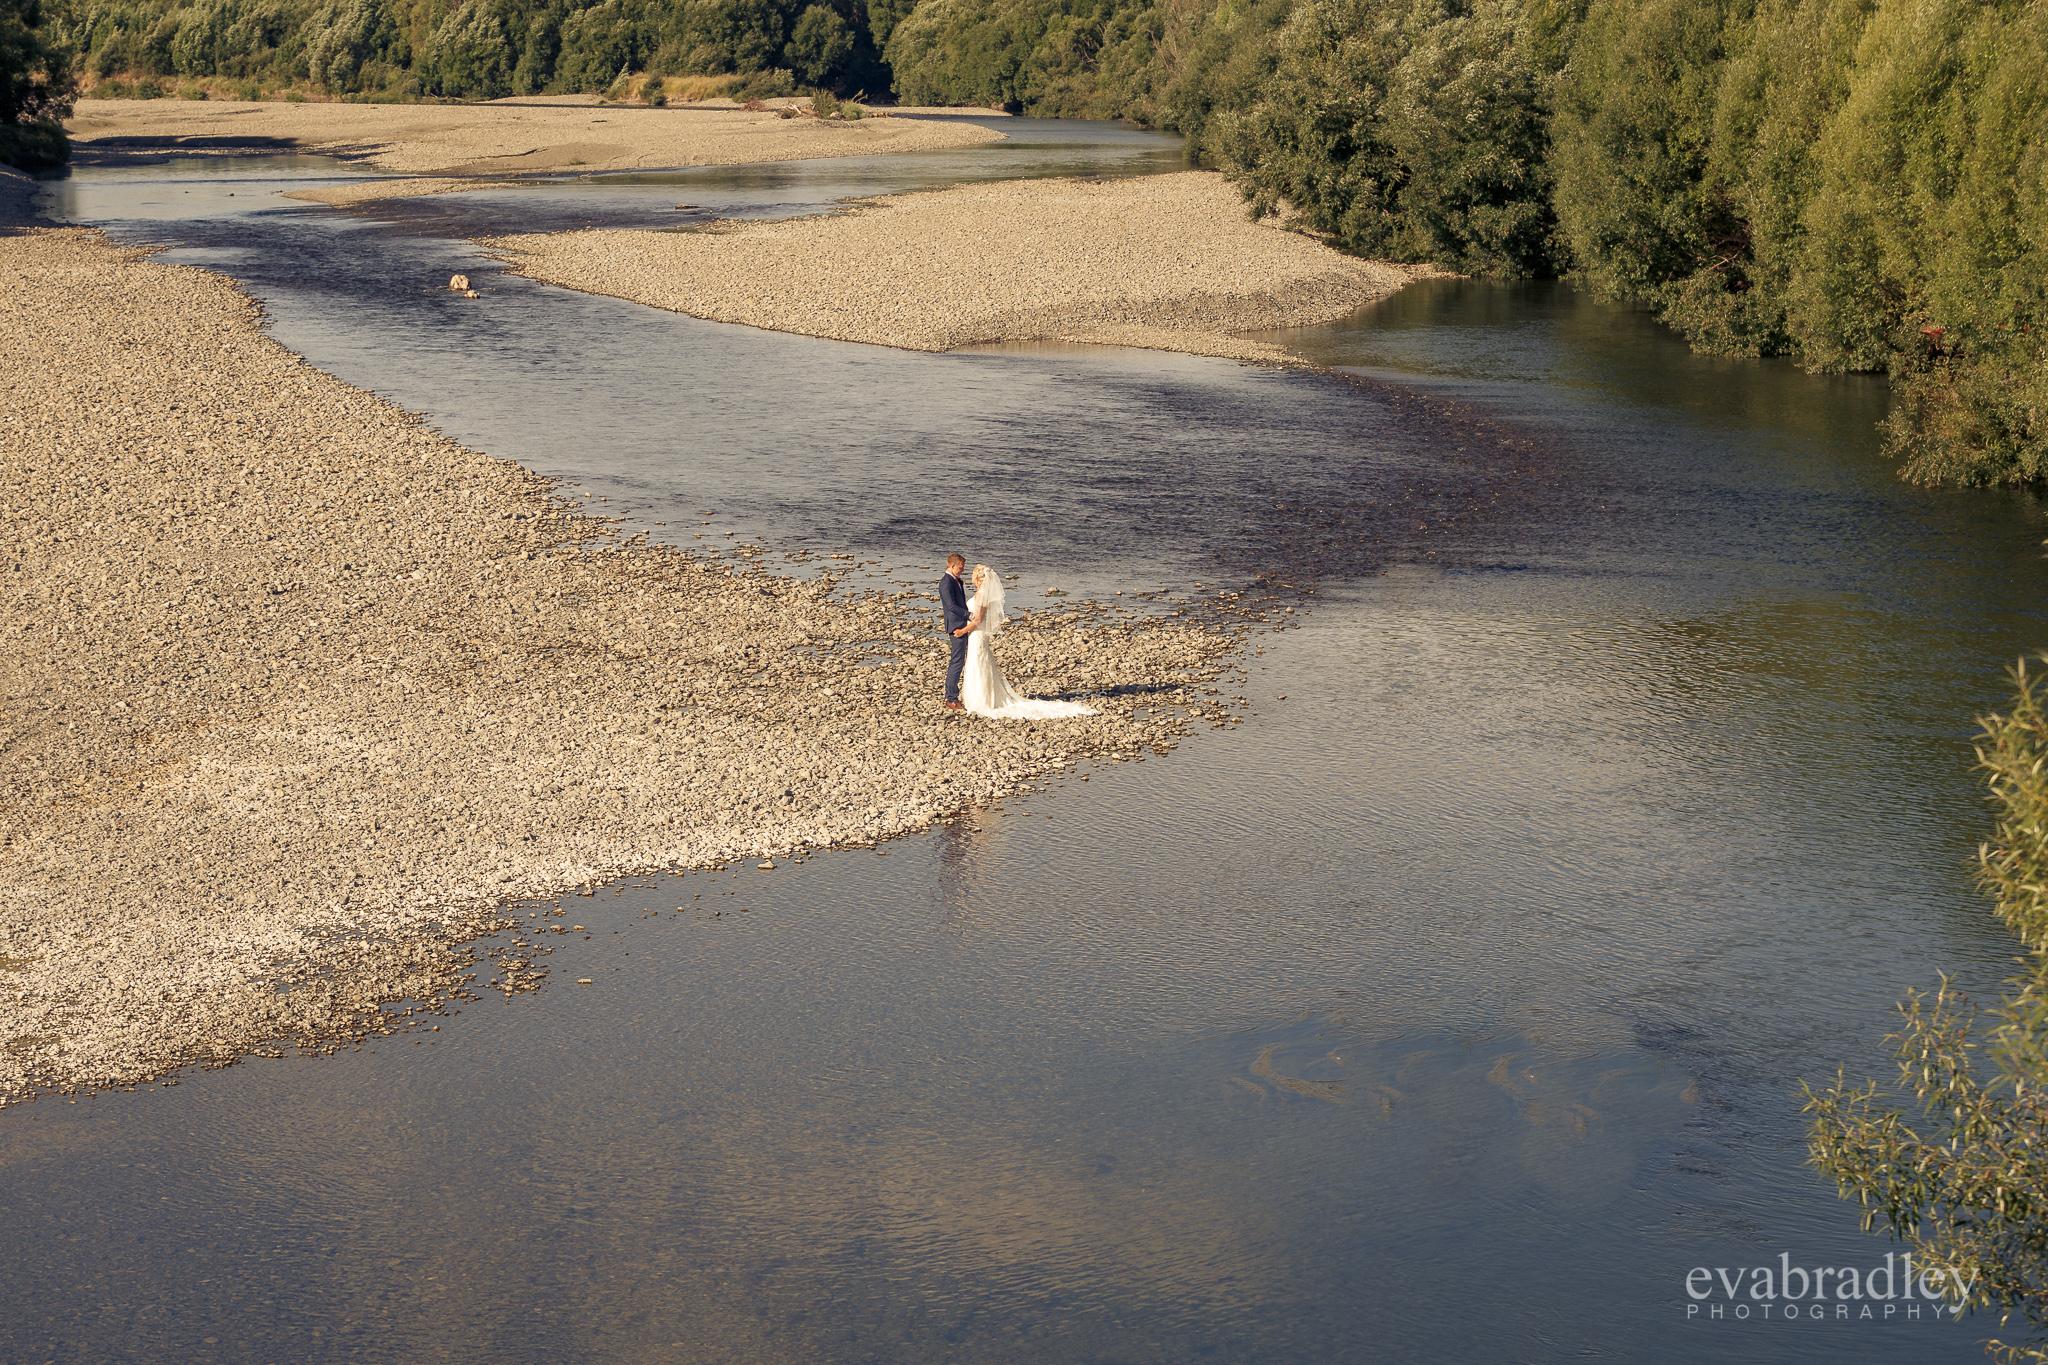 nz-river-wedding-photography-eva-bradley